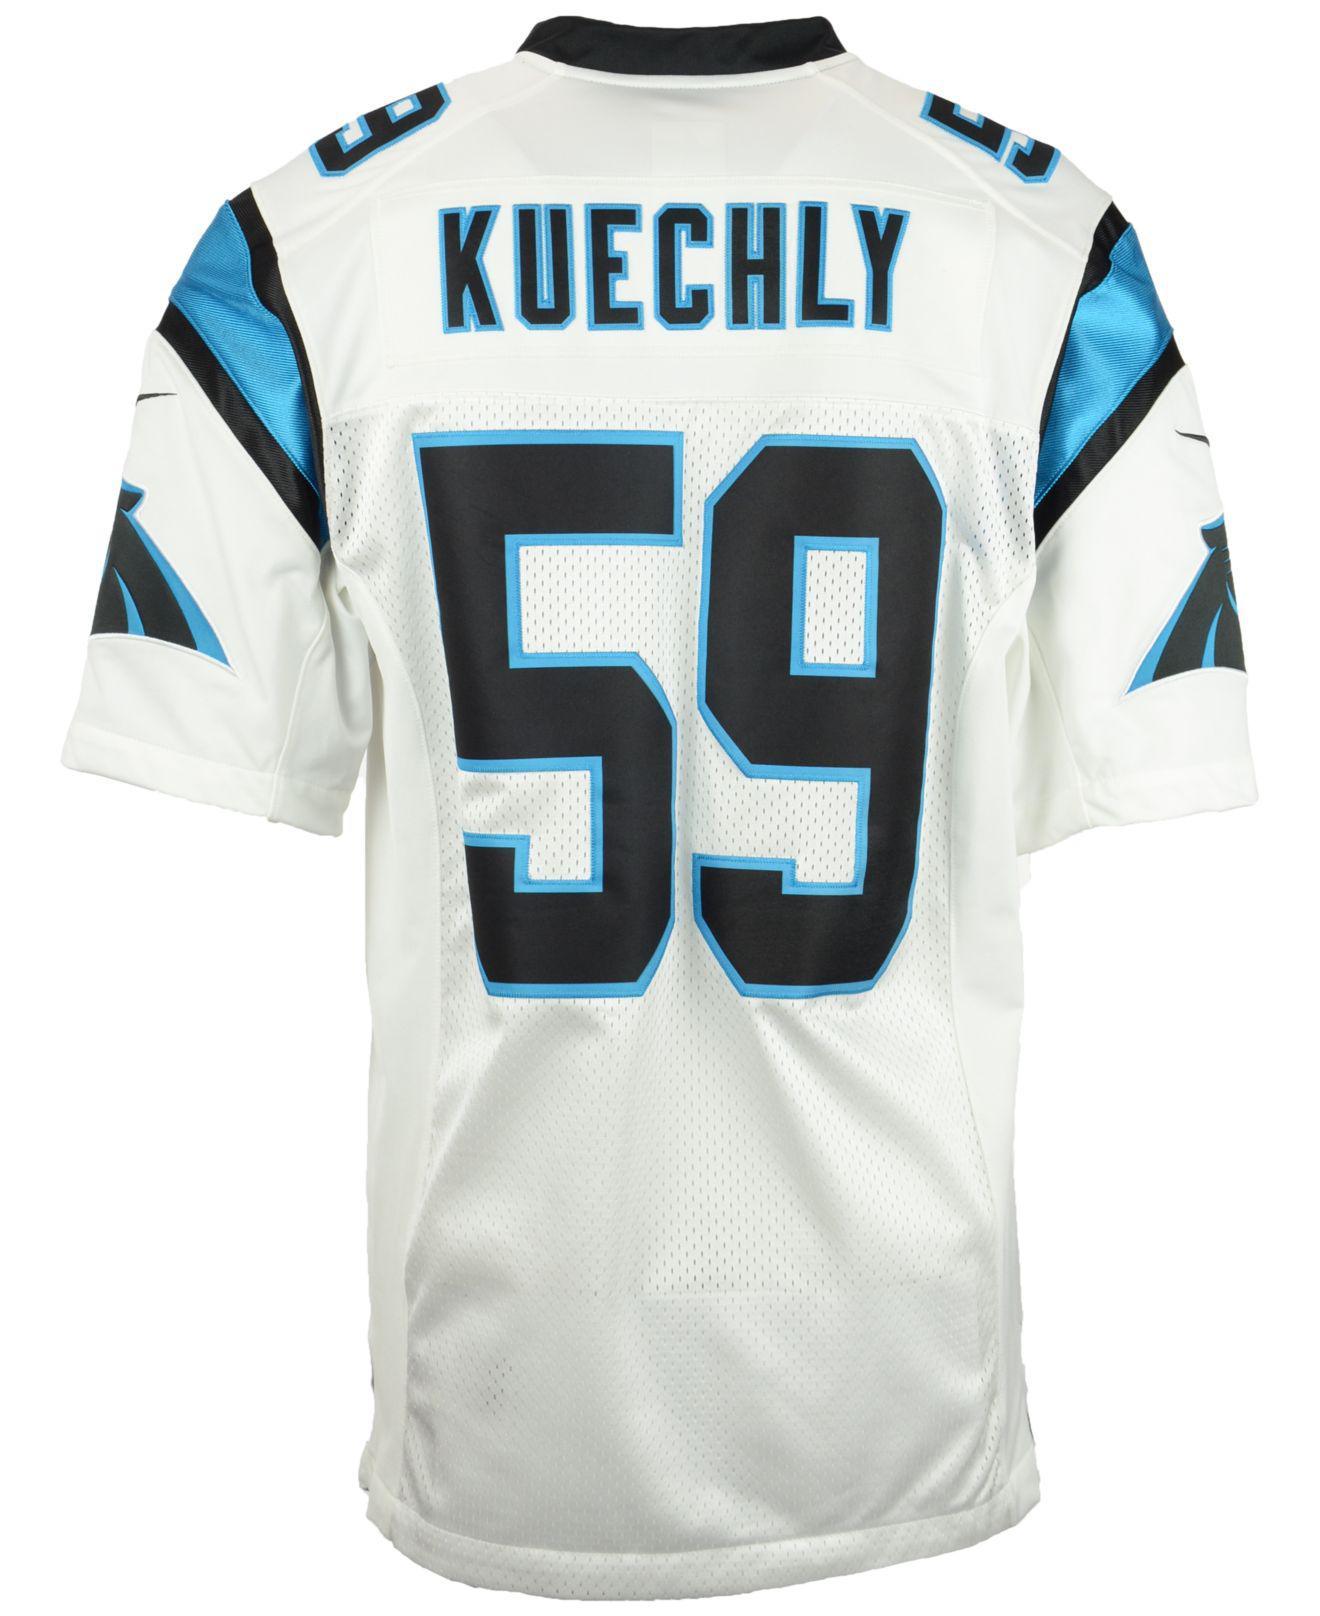 Lyst - Nike Men s Luke Kuechly Carolina Panthers Limited Jersey in ... 2c32400ab